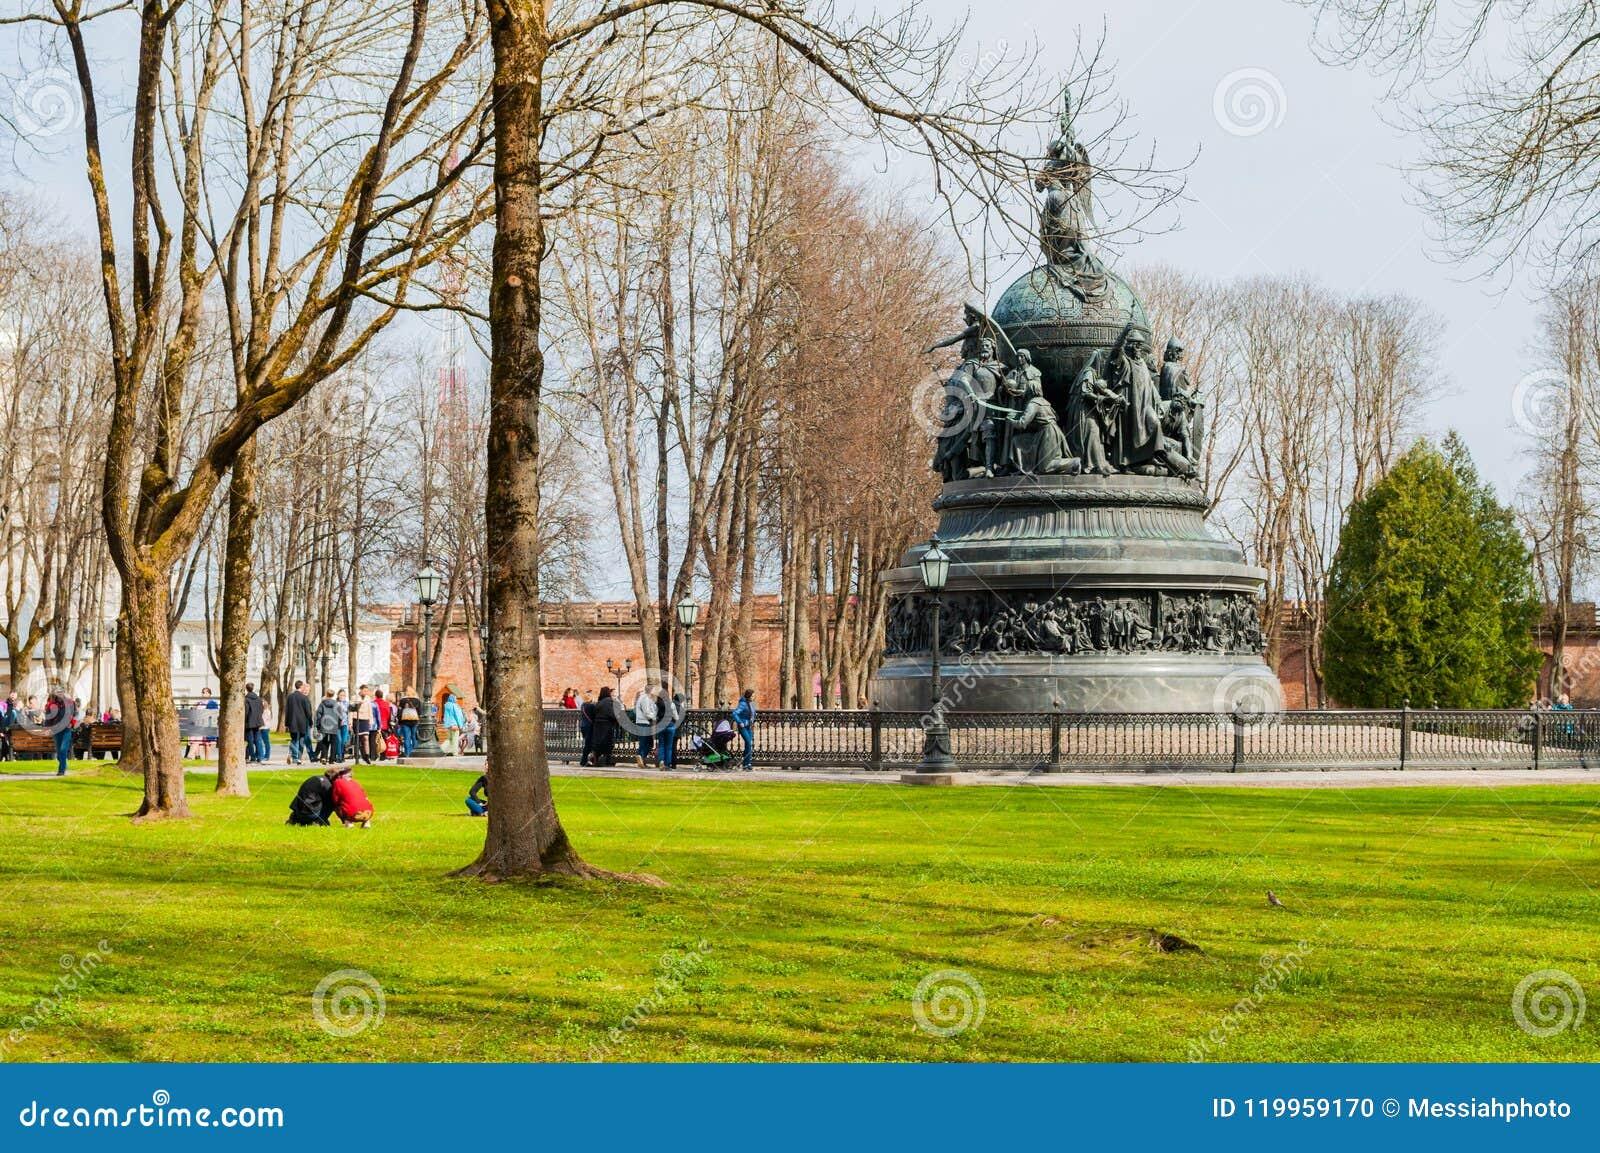 Kremlin, Veliky Novgorod: photos, excursions, address of sights 71